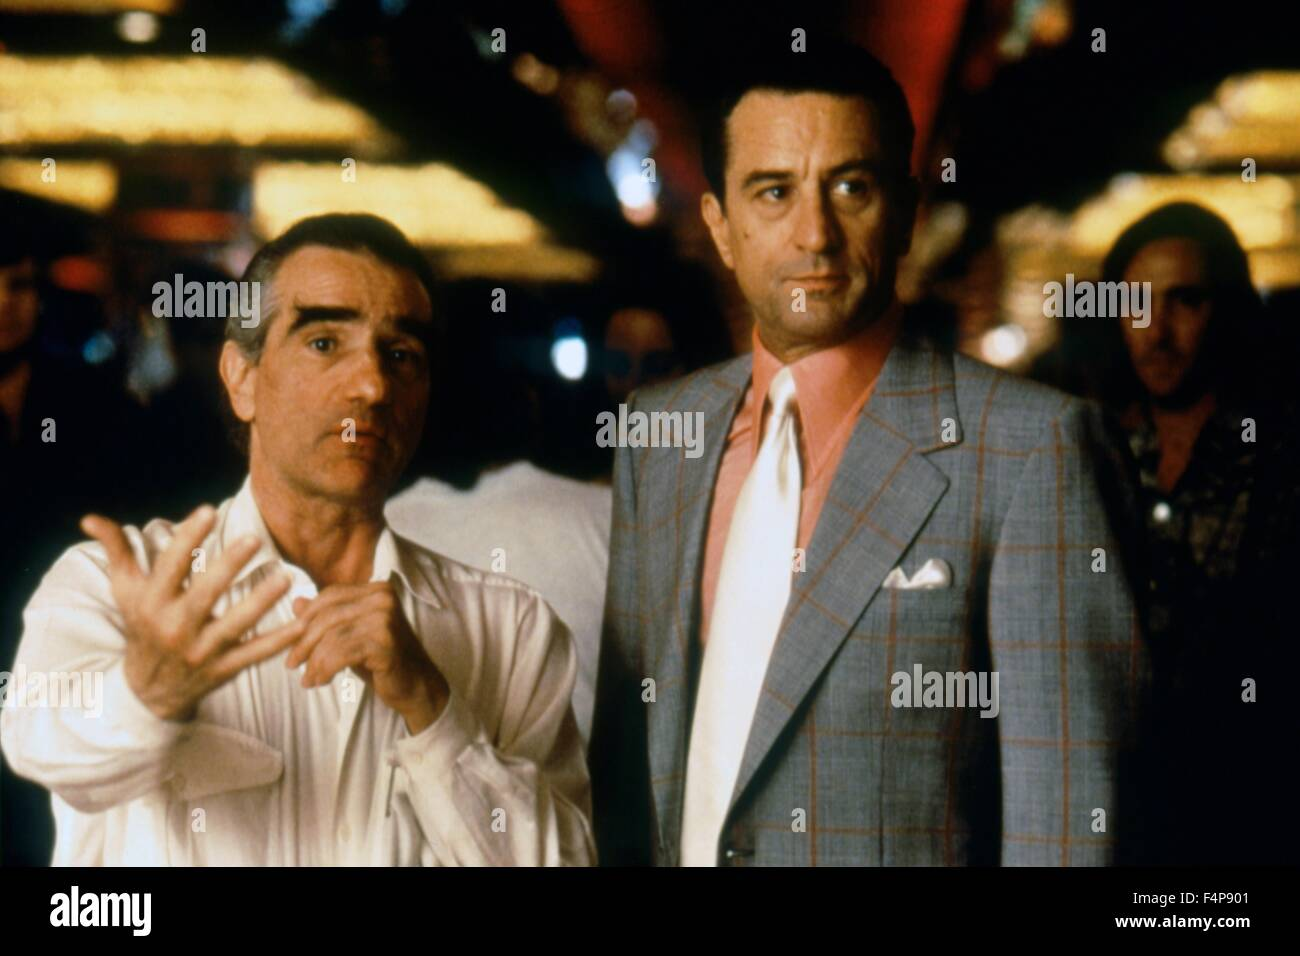 Martin Scorsese, Robert de Niro / Casino 1995 directed by Martin Scorsese - Stock Image